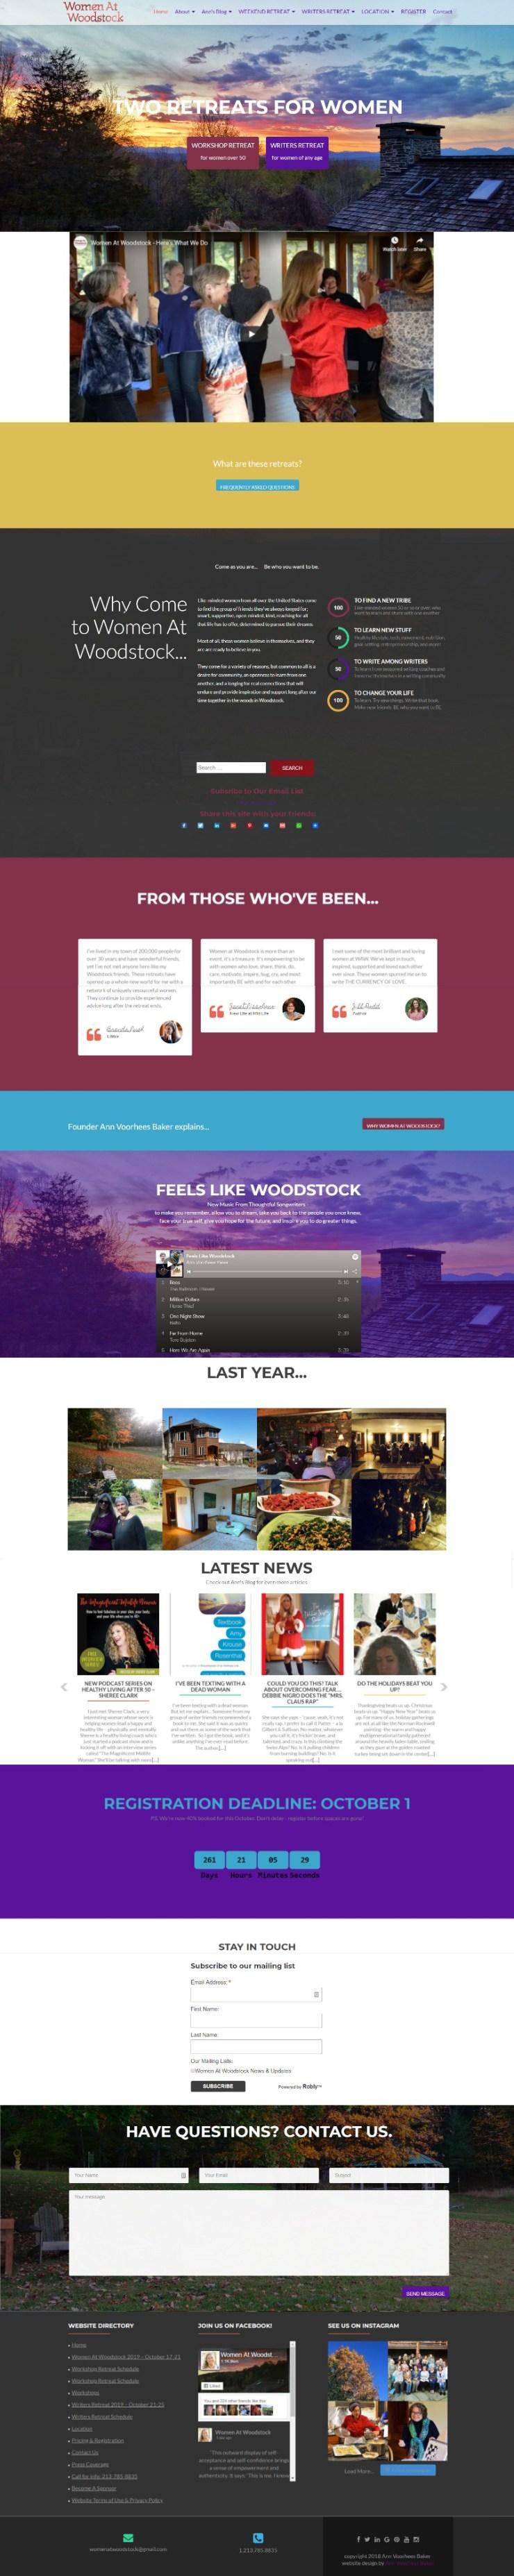 Women At Woodstock website screenshot